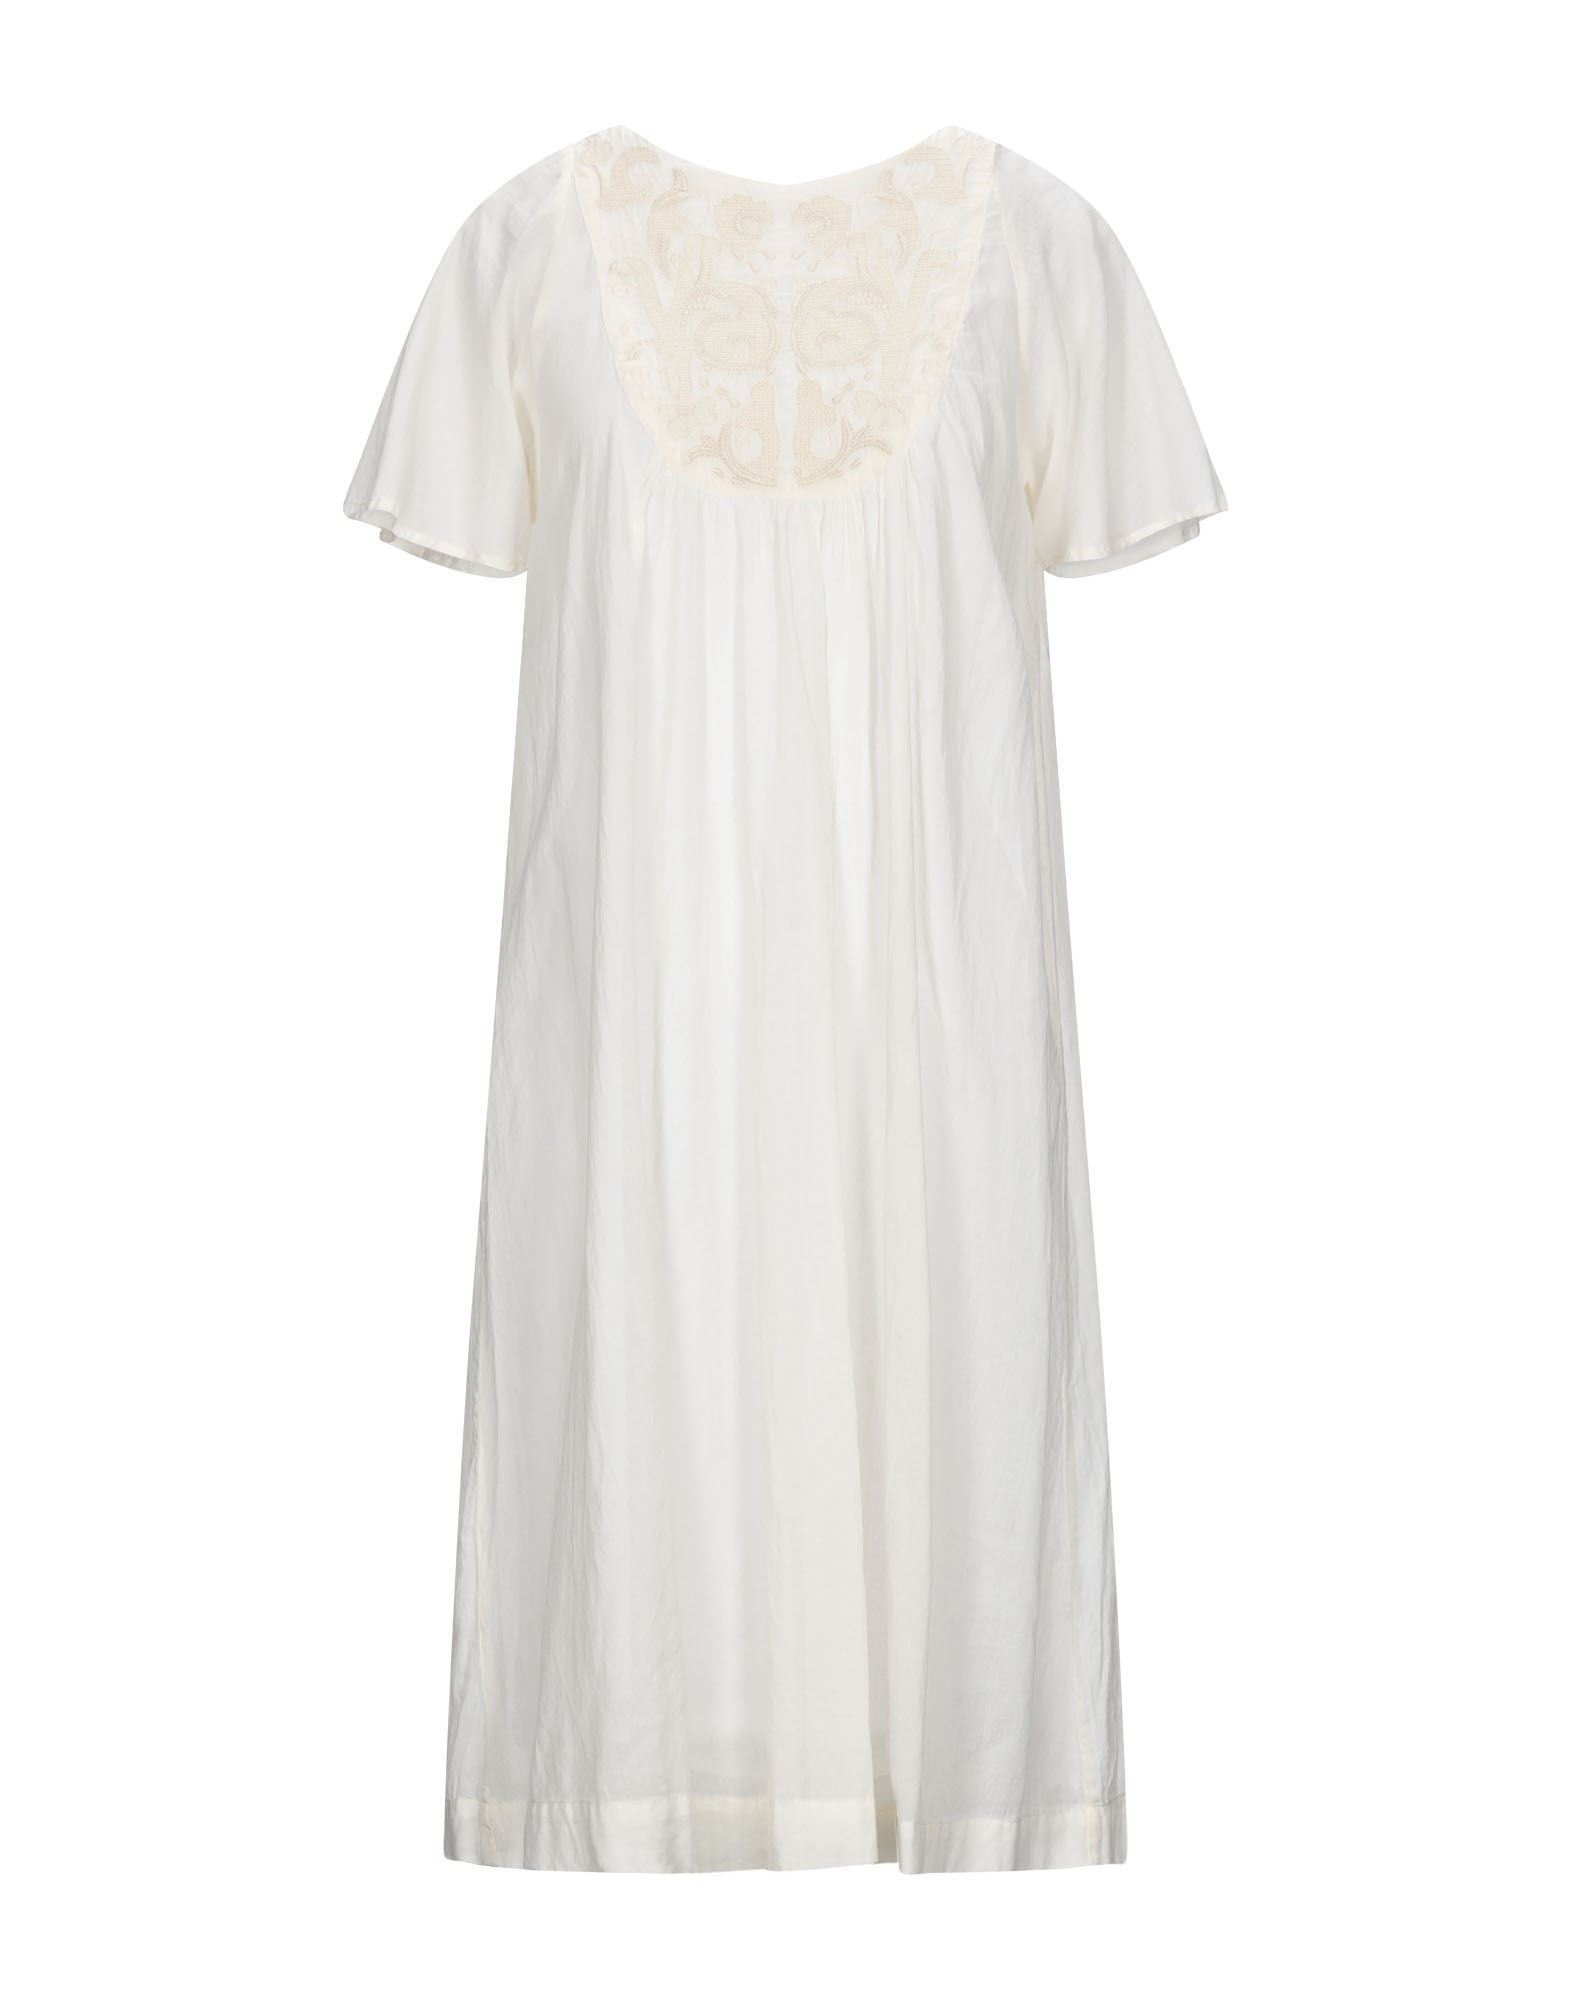 LOCAL APPAREL Платье до колена local apparel топ без рукавов